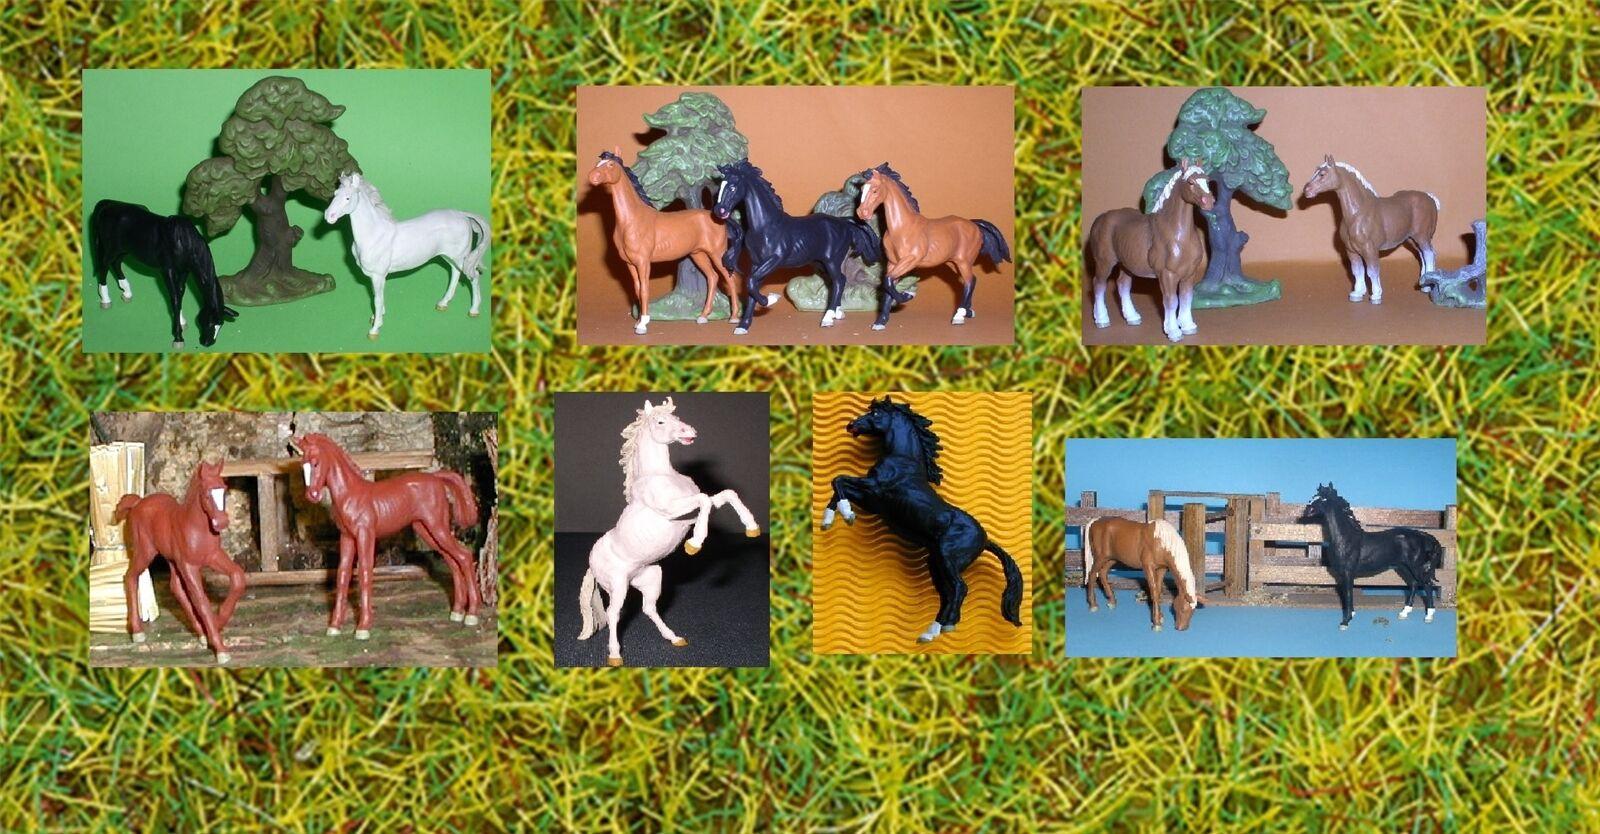 Preiser-Elastolin-caballos-potros variantes variantes variantes 1, escala 1 25 - pista g apto-GMK  precios al por mayor